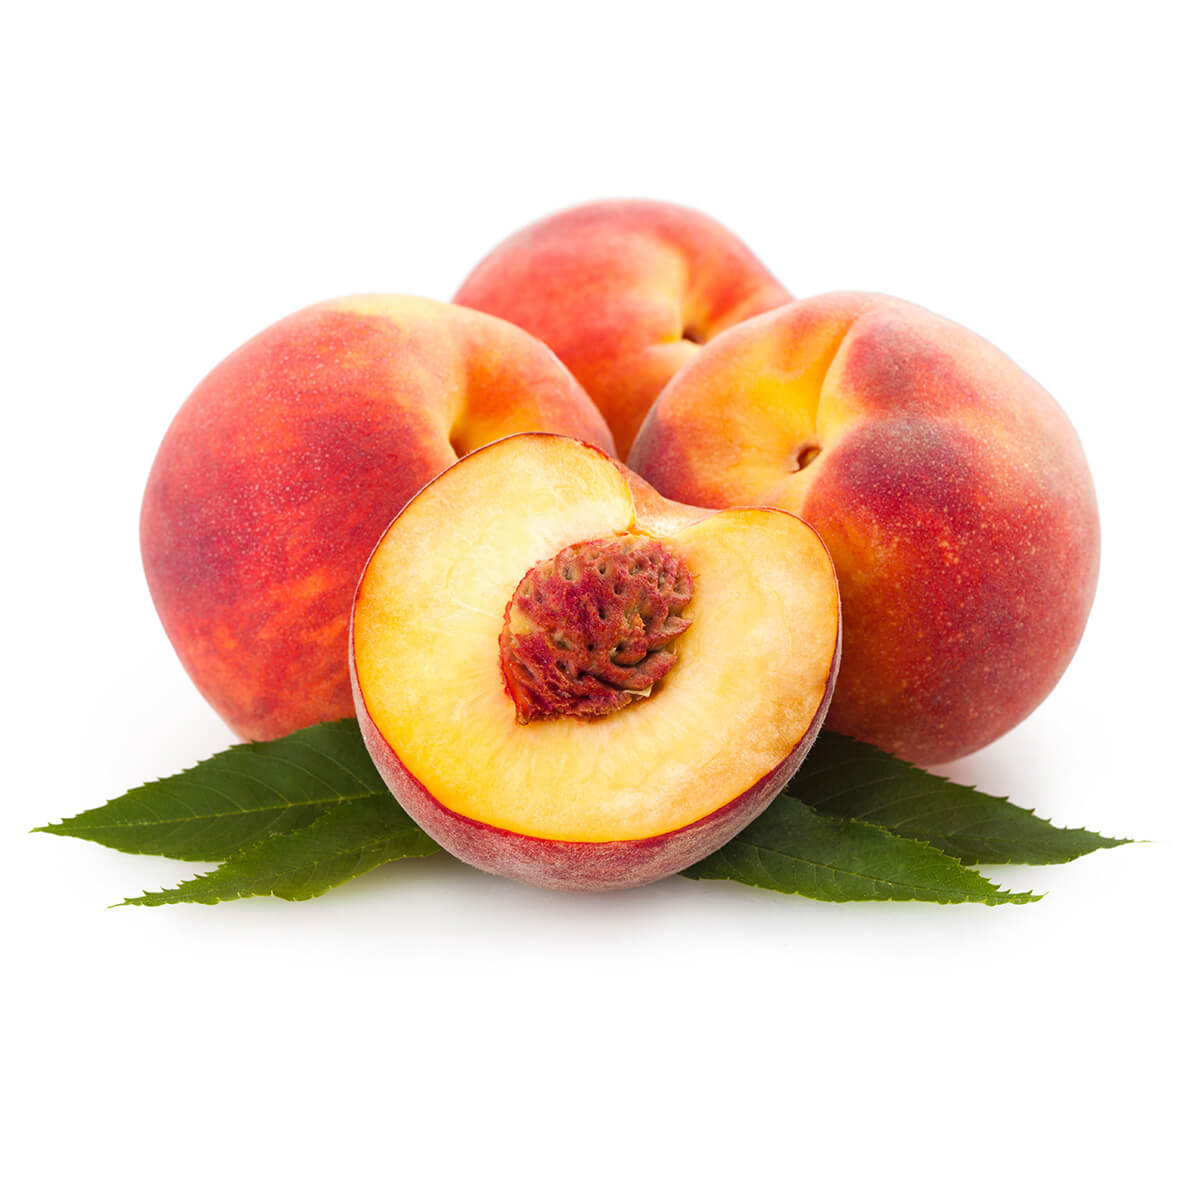 Peach kernel oil benefits for skin